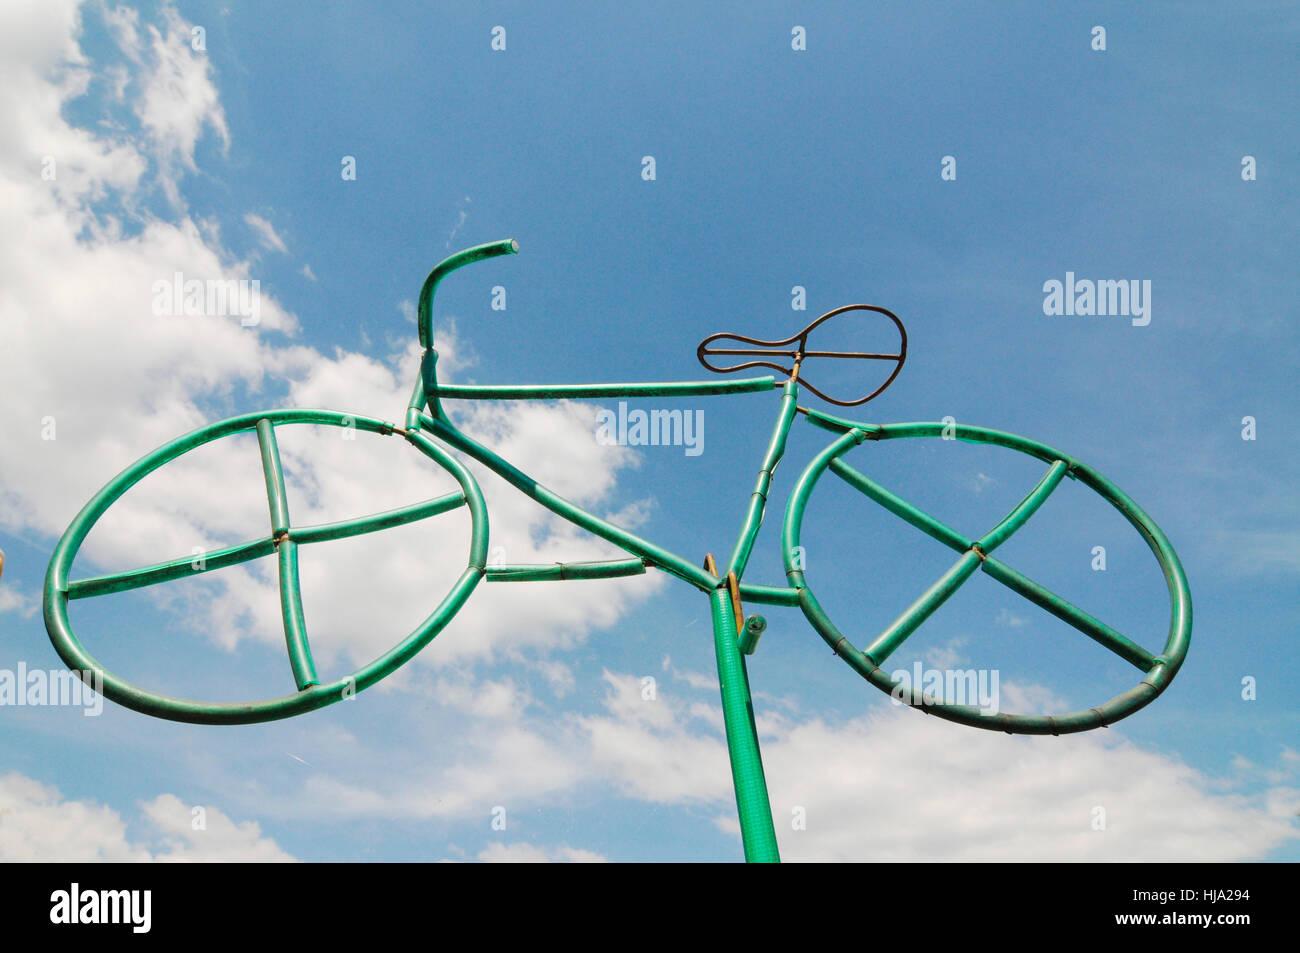 drive, wheel, traffic, transportation, biker, road traffic, transport, means of - Stock Image